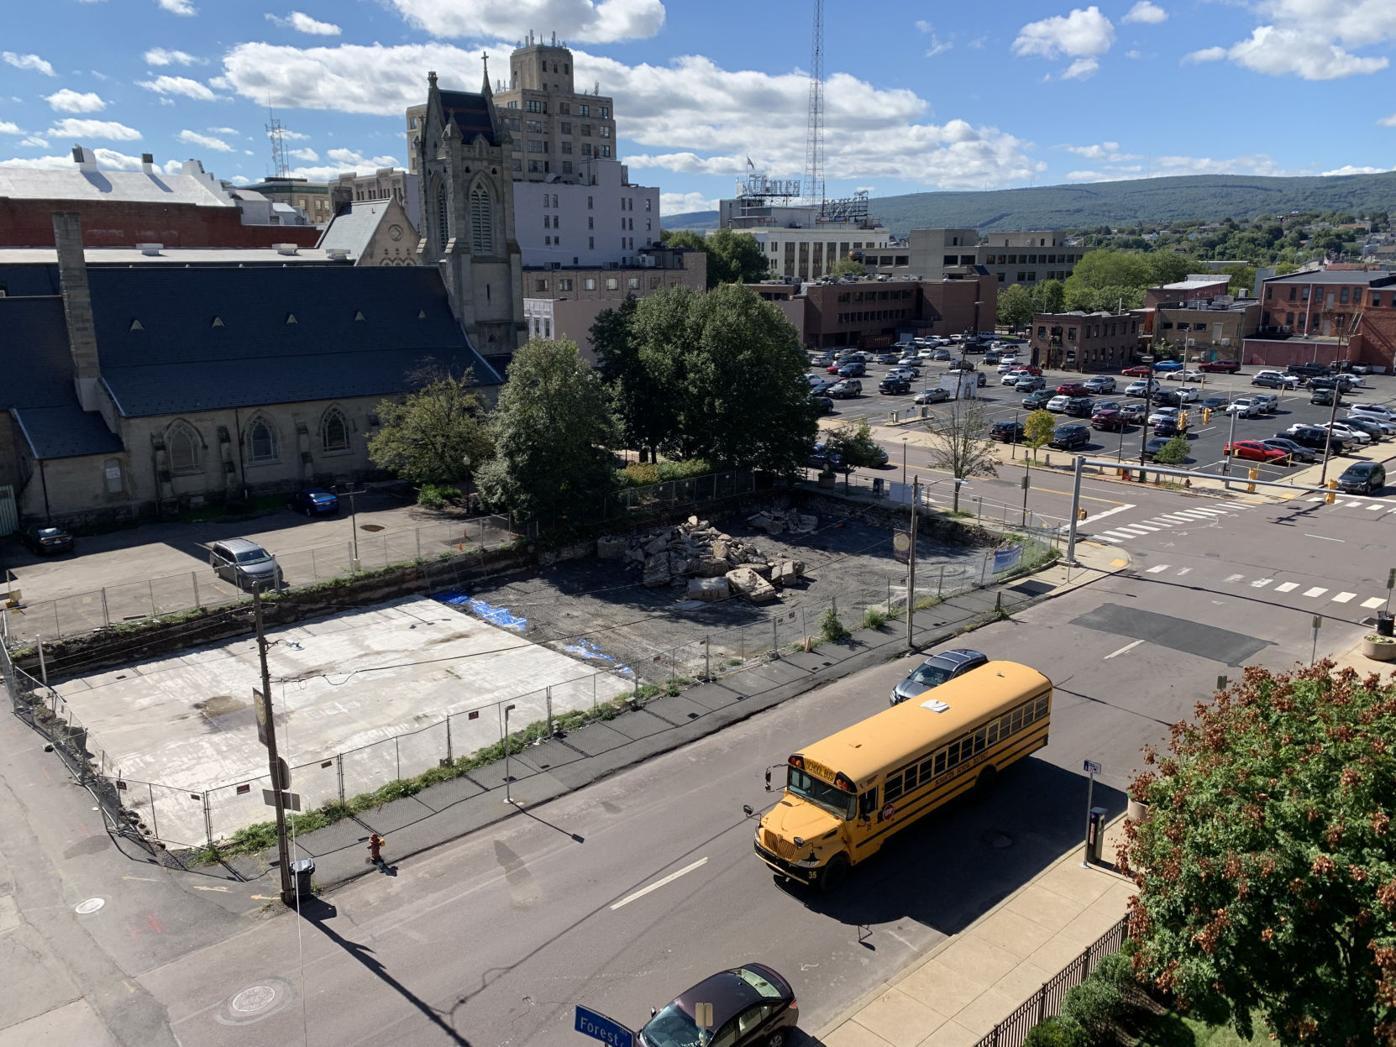 Downtown Scranton pocket park remains work in progress